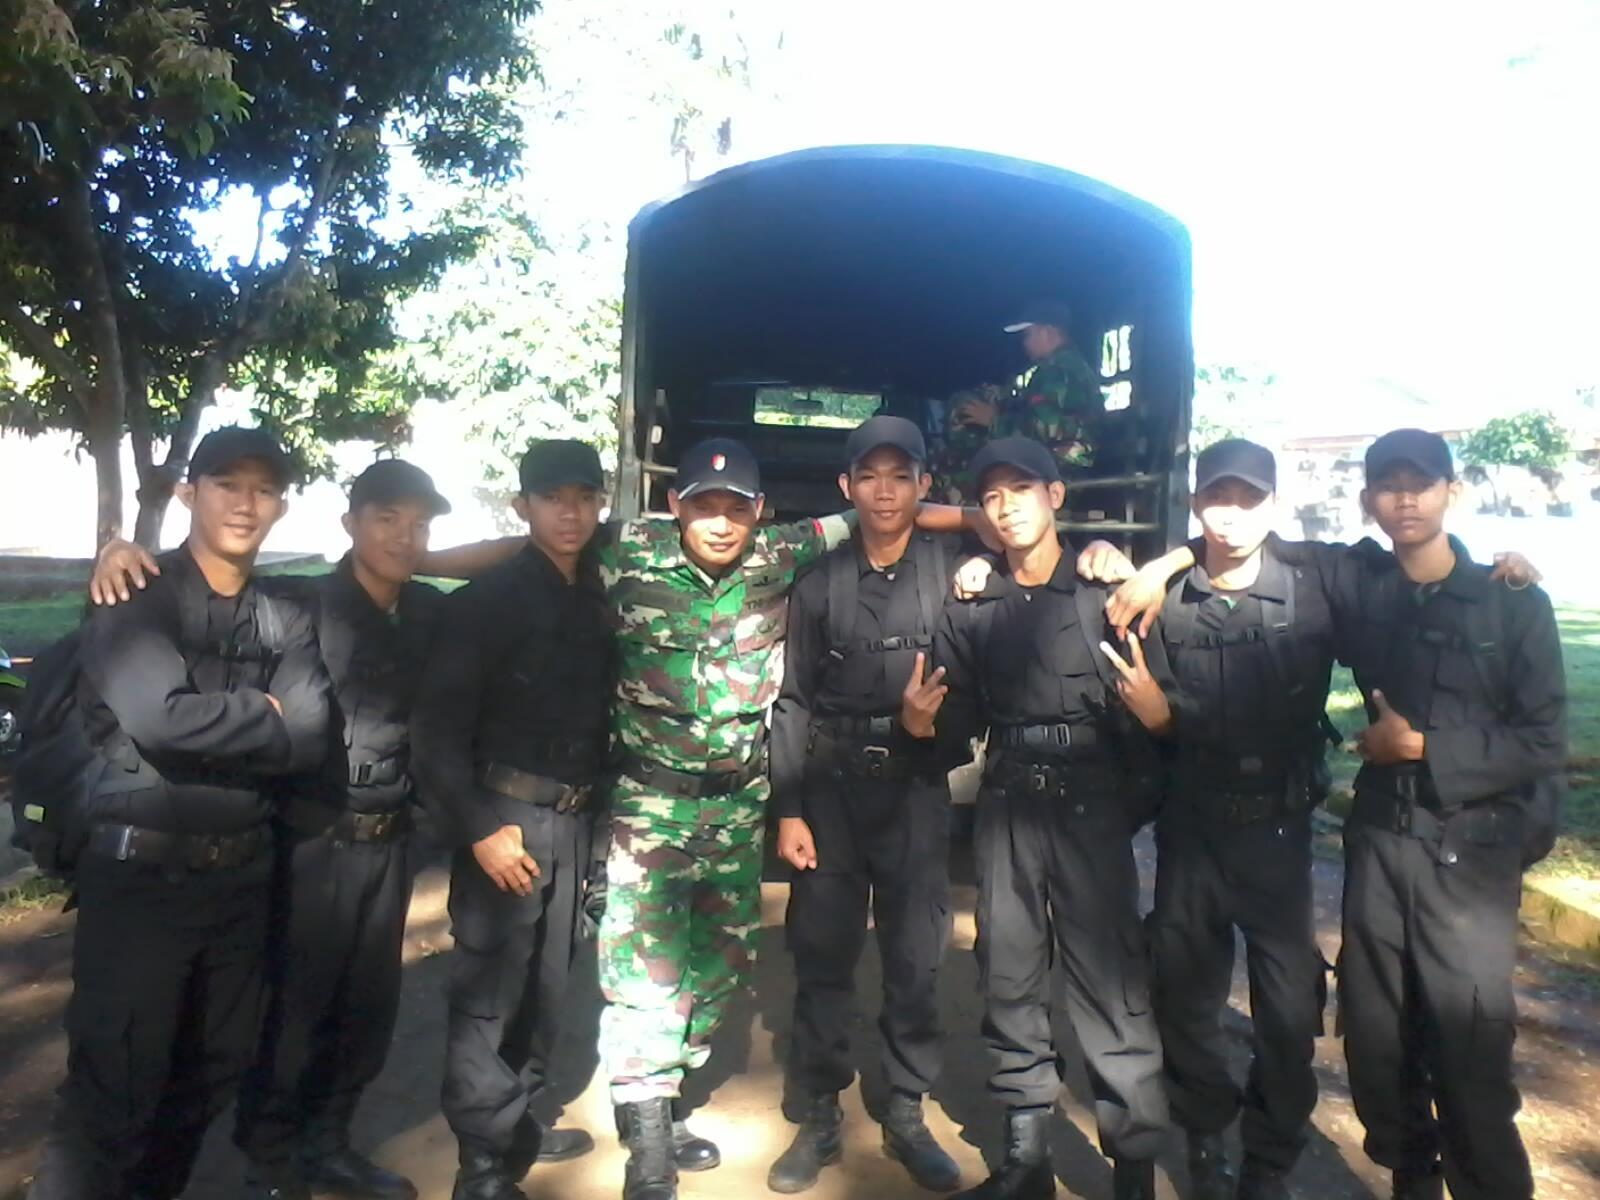 . TNI AD 700/RAIDER http://t.co/daeqpyCkc6